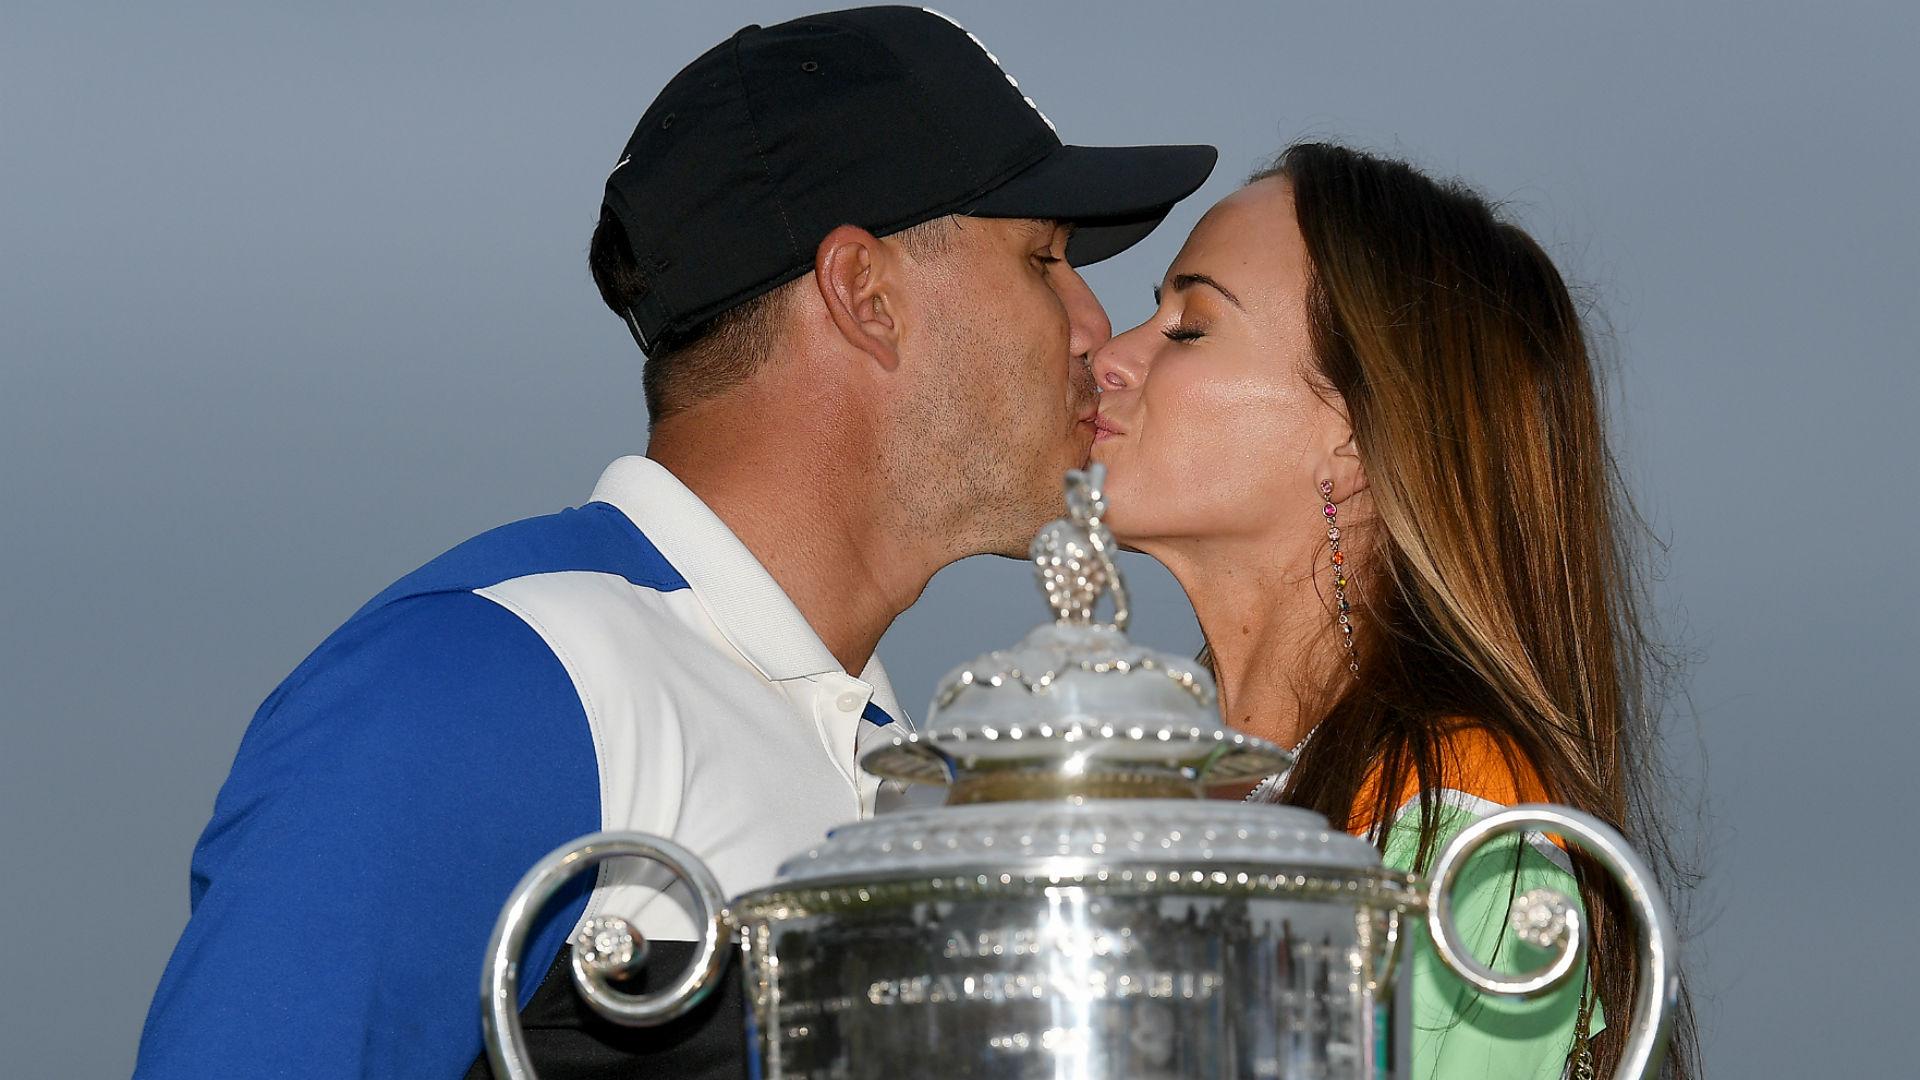 Brooks Koepka s Girlfriend Jena Sims Finally Gets Kiss